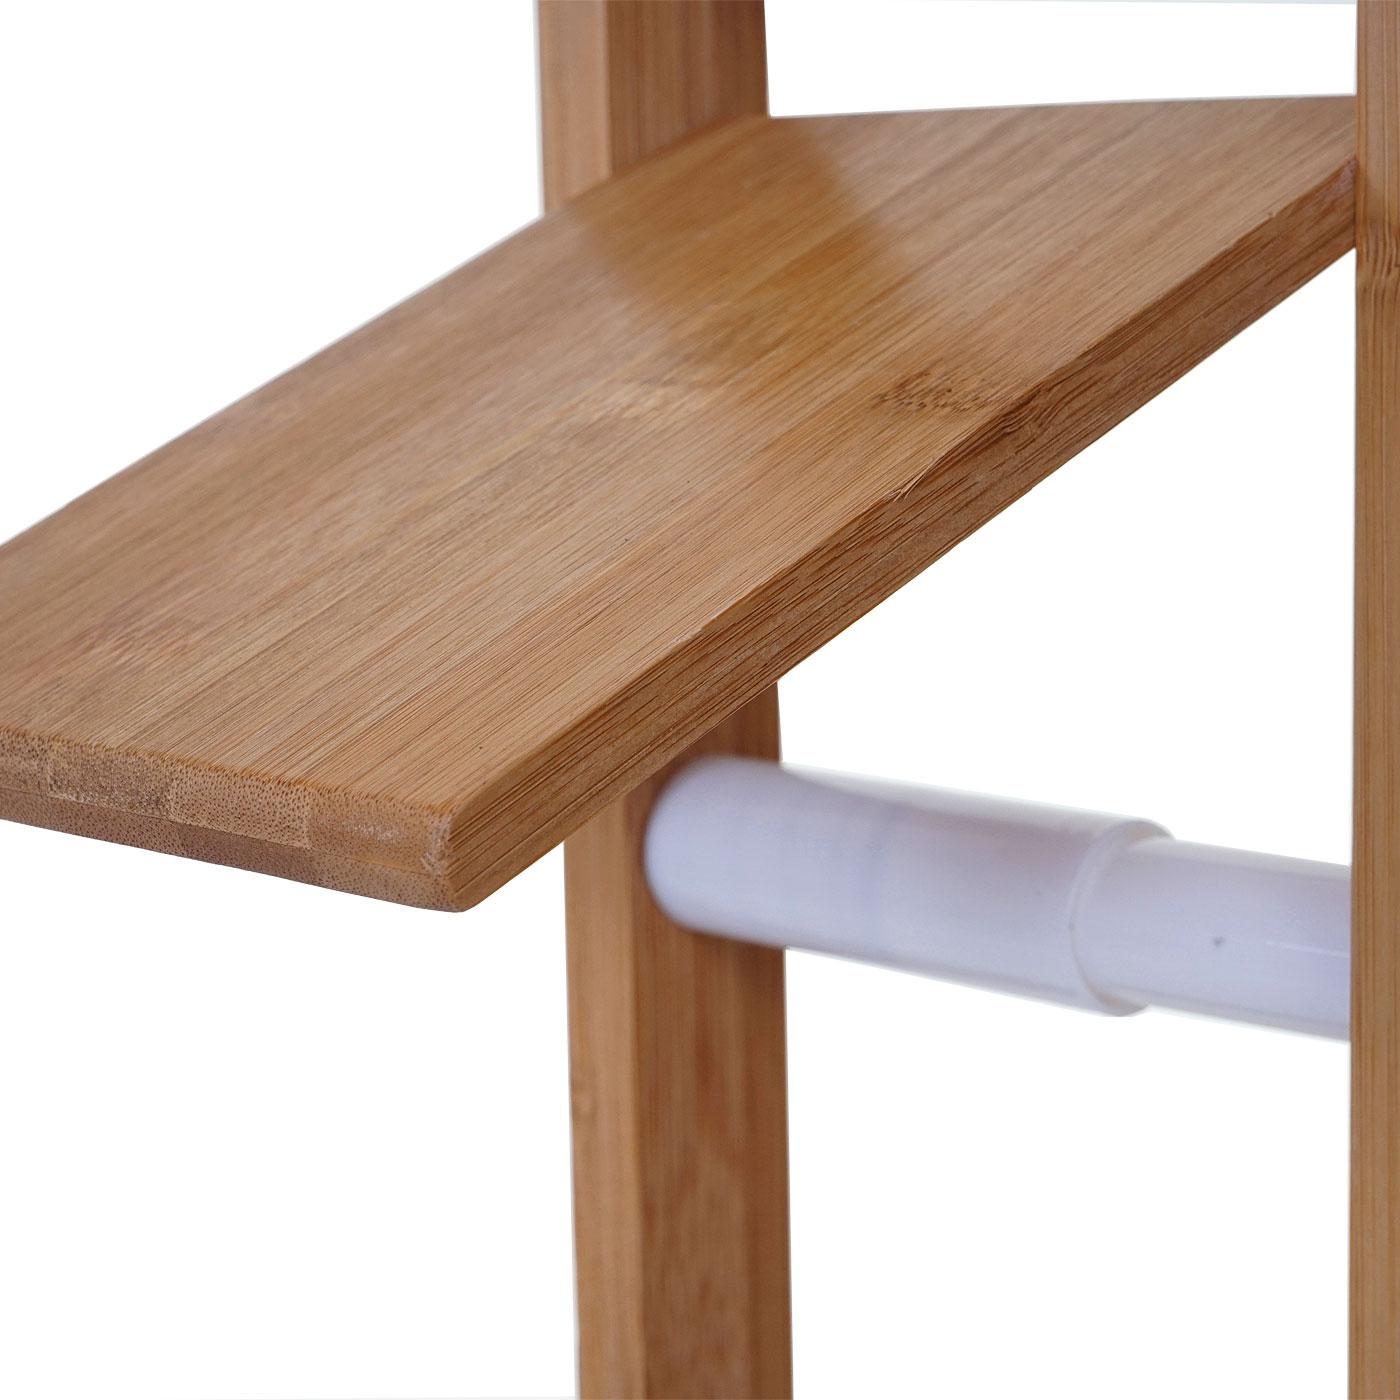 wc papierhalter hwc b18 klopapierhalter. Black Bedroom Furniture Sets. Home Design Ideas